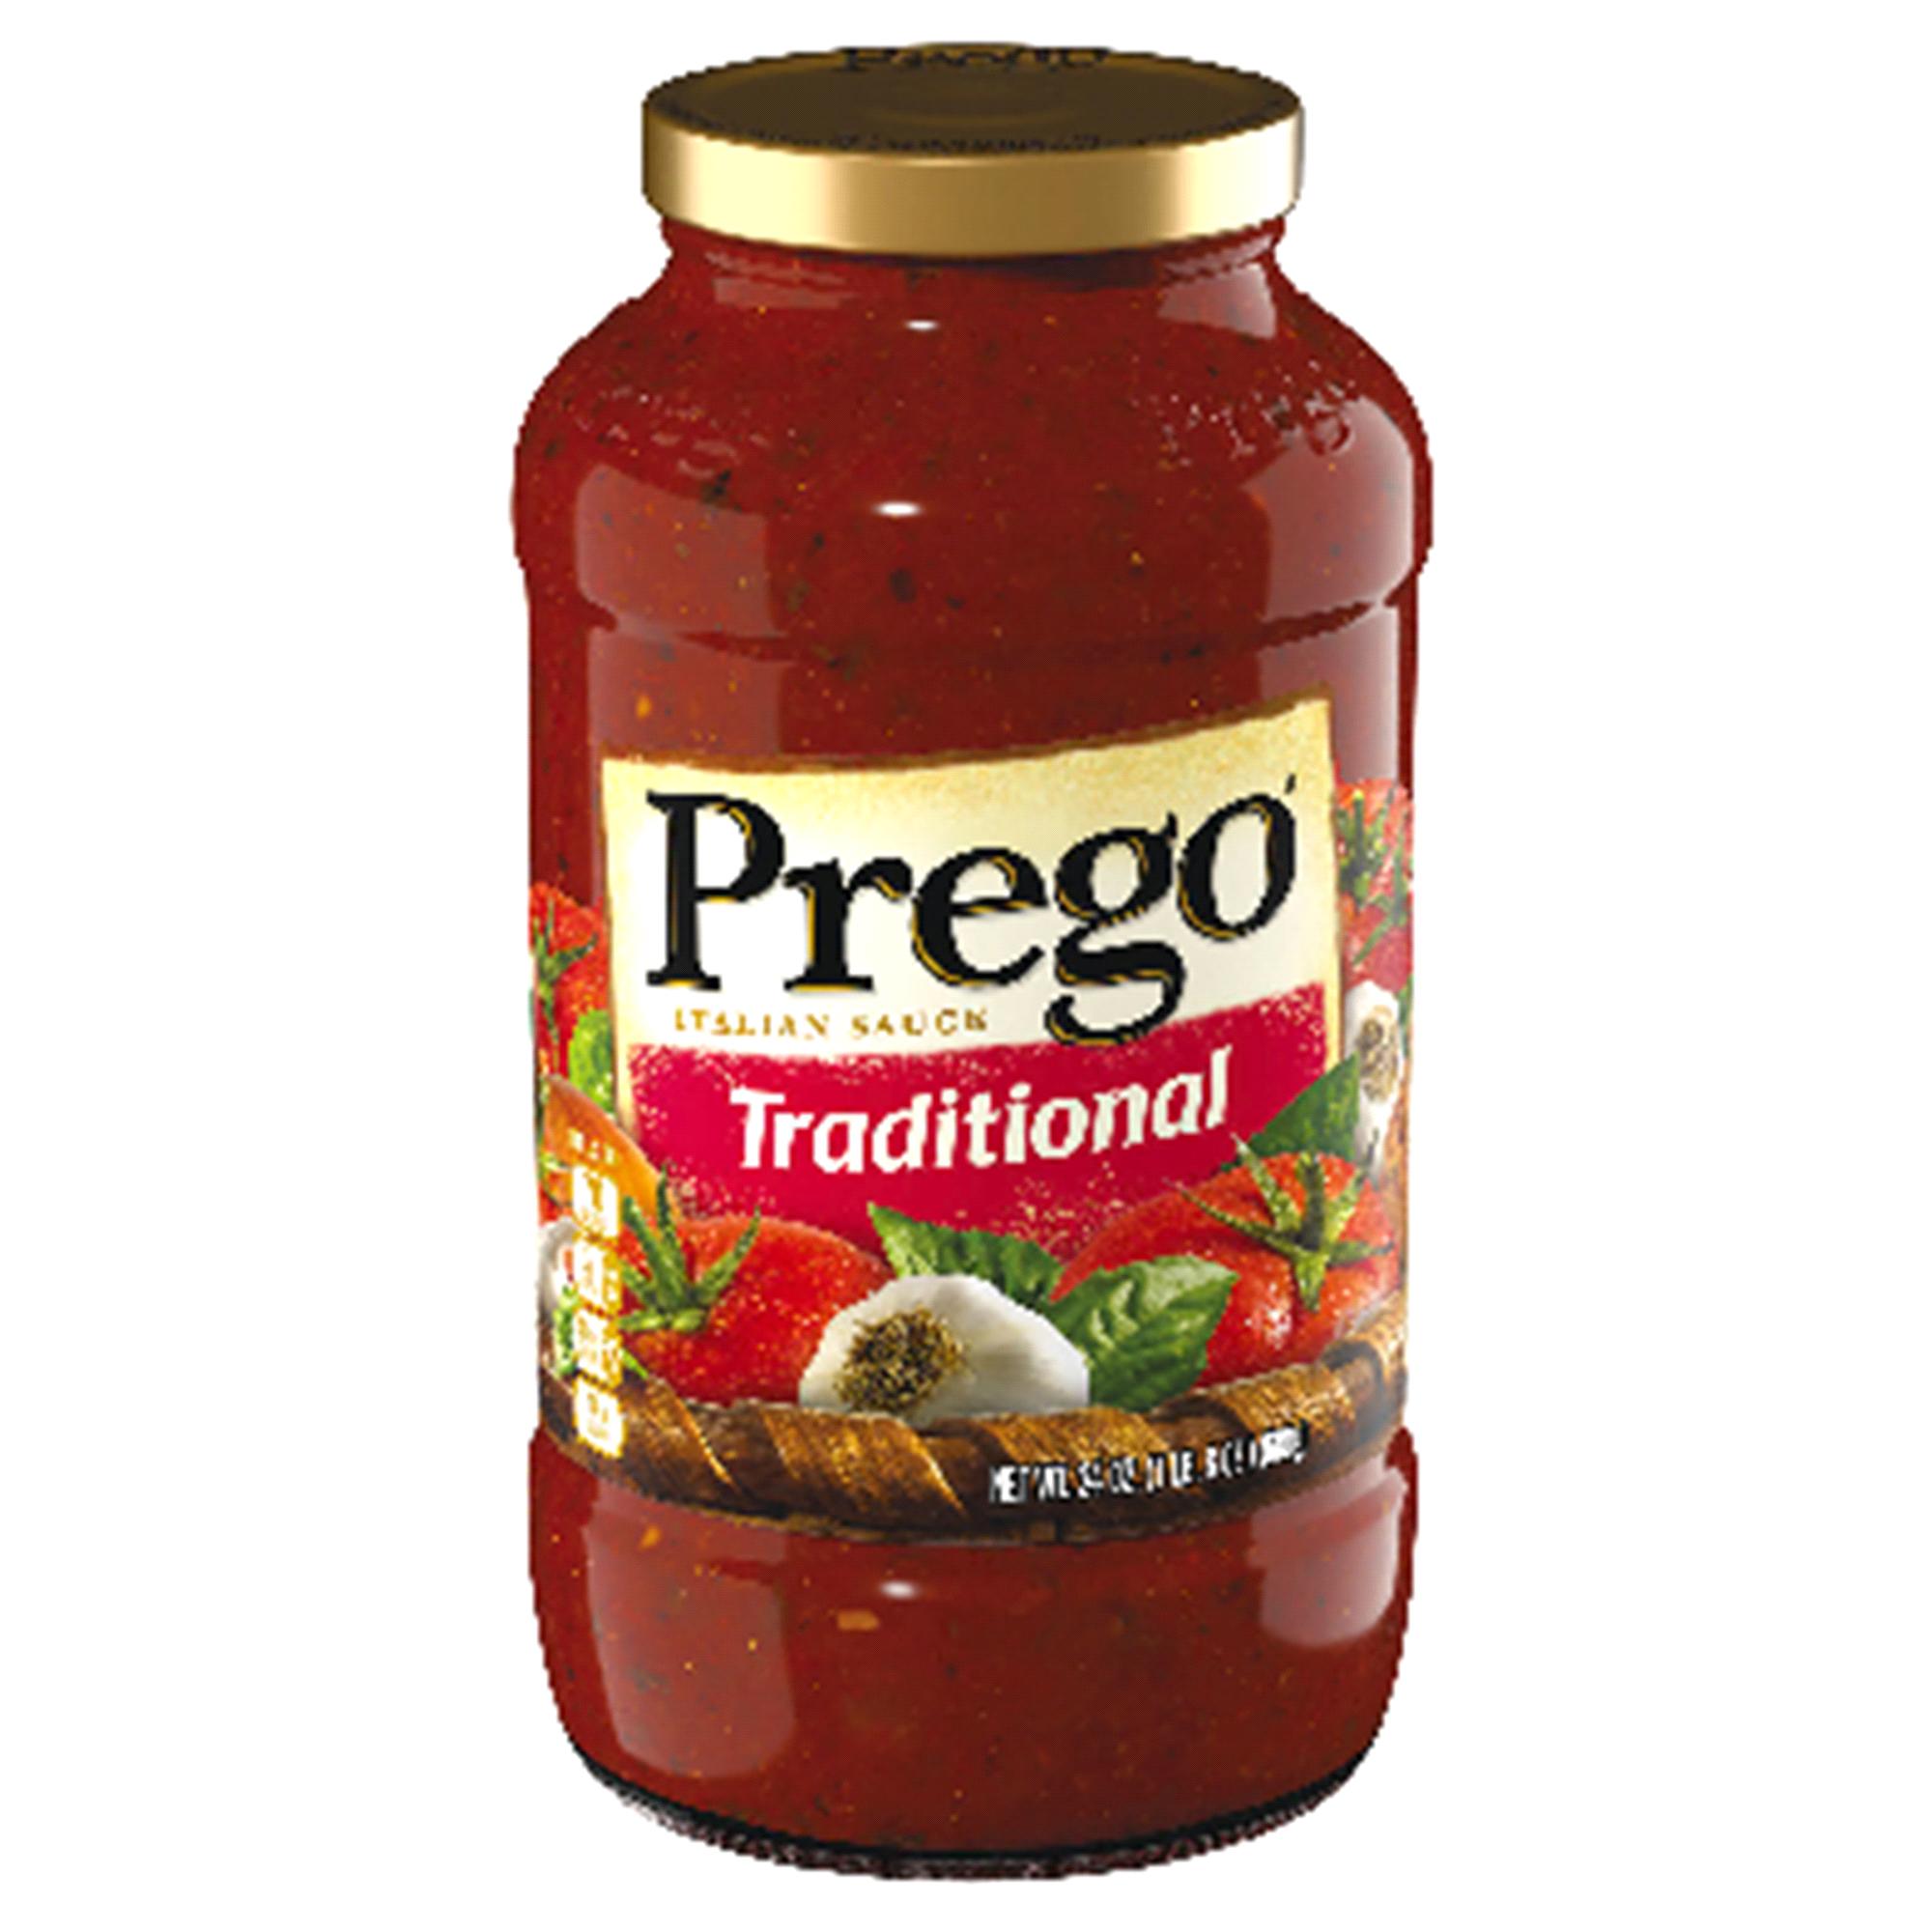 dairy free pasta sauce brands